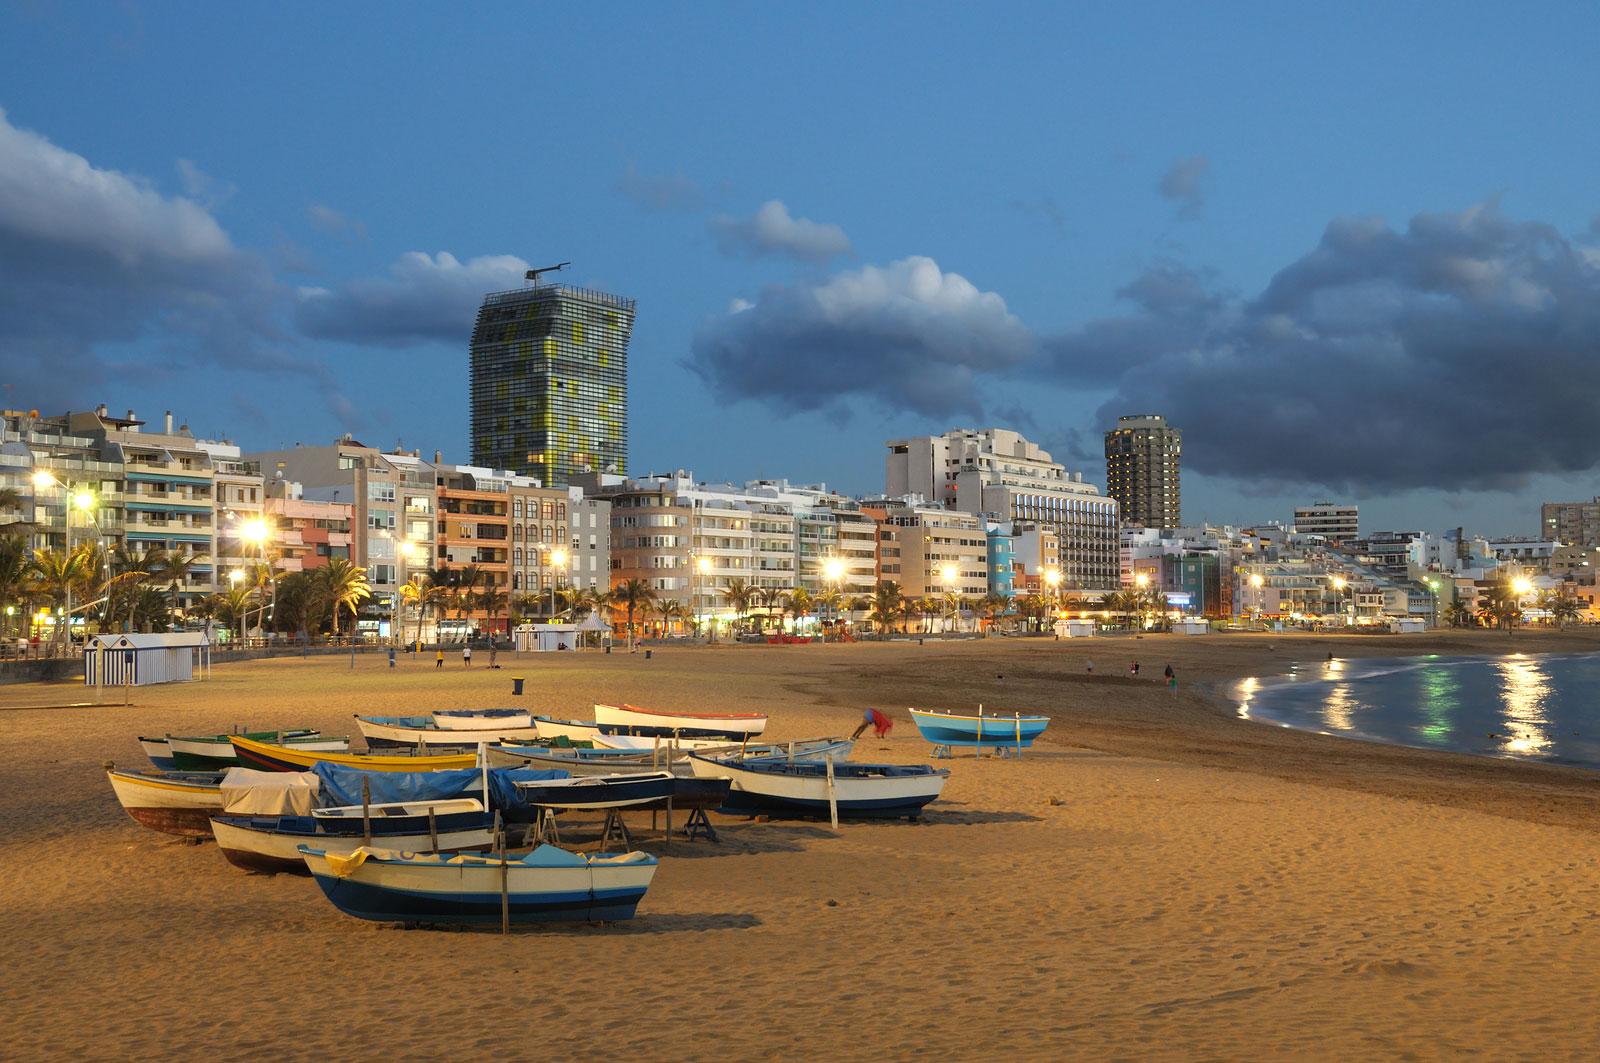 Santa Catalina Las Palmas